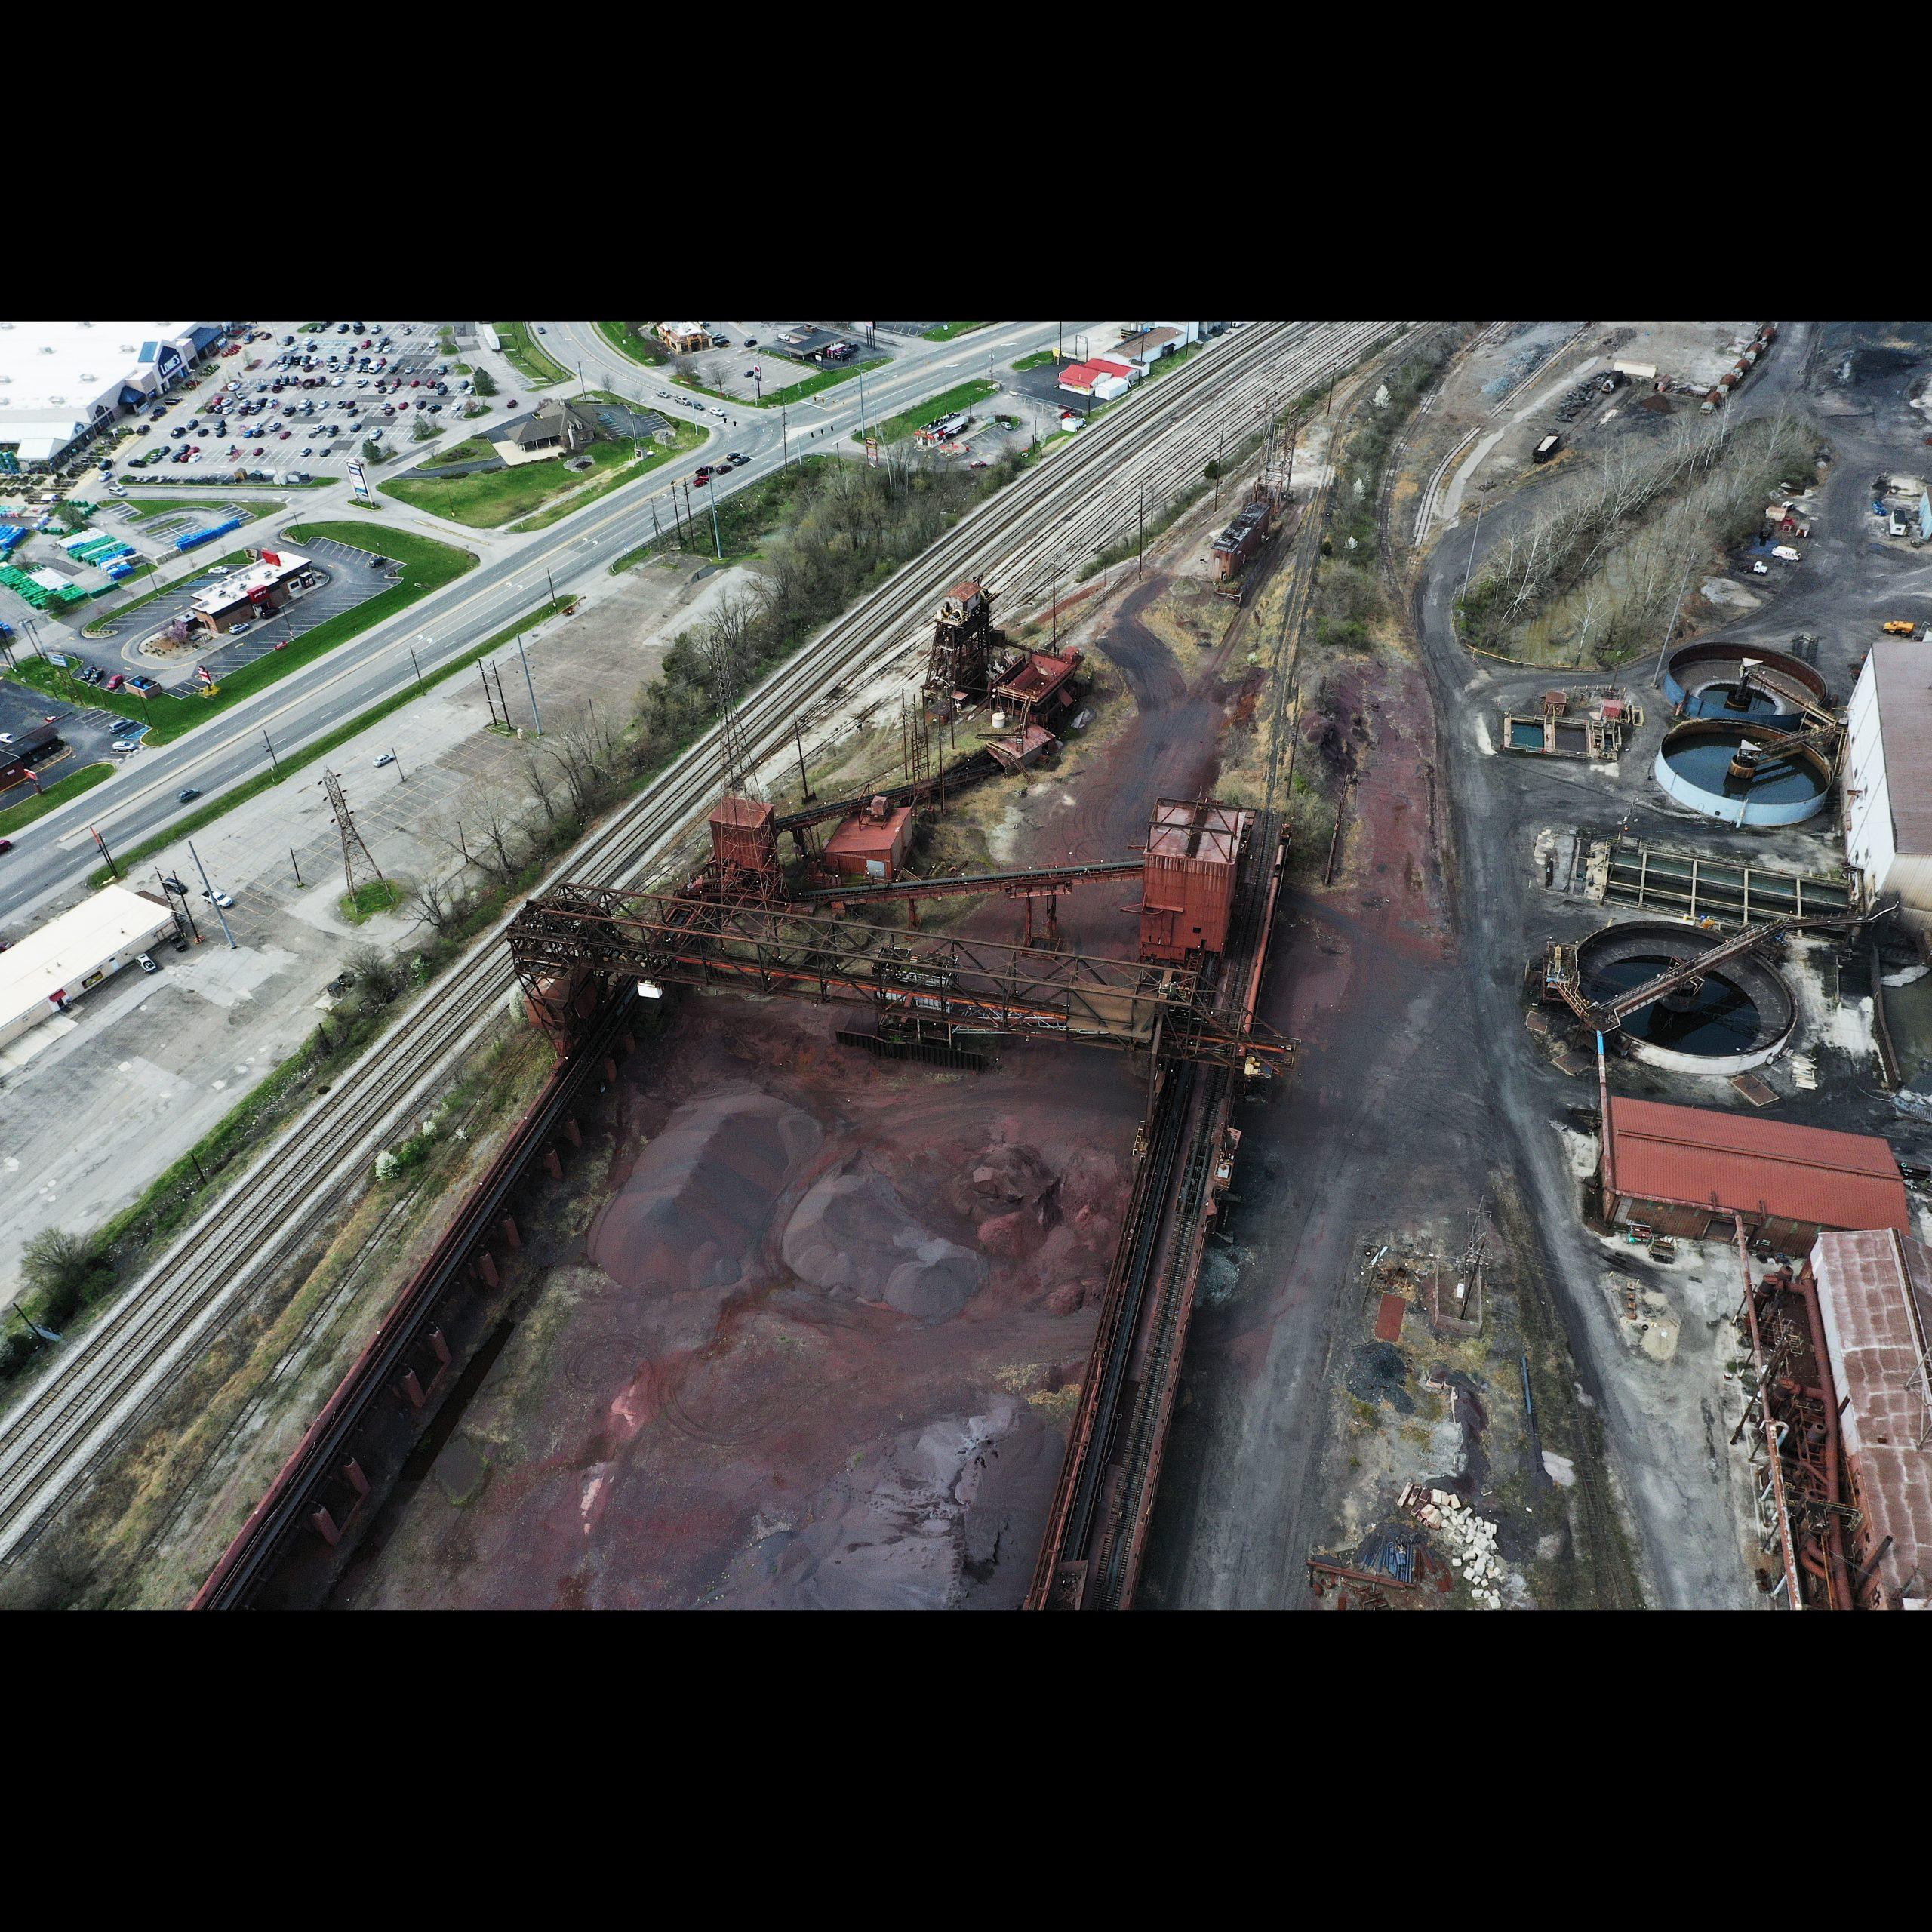 AK Steel Ashland Works - Ore Field and Trestle